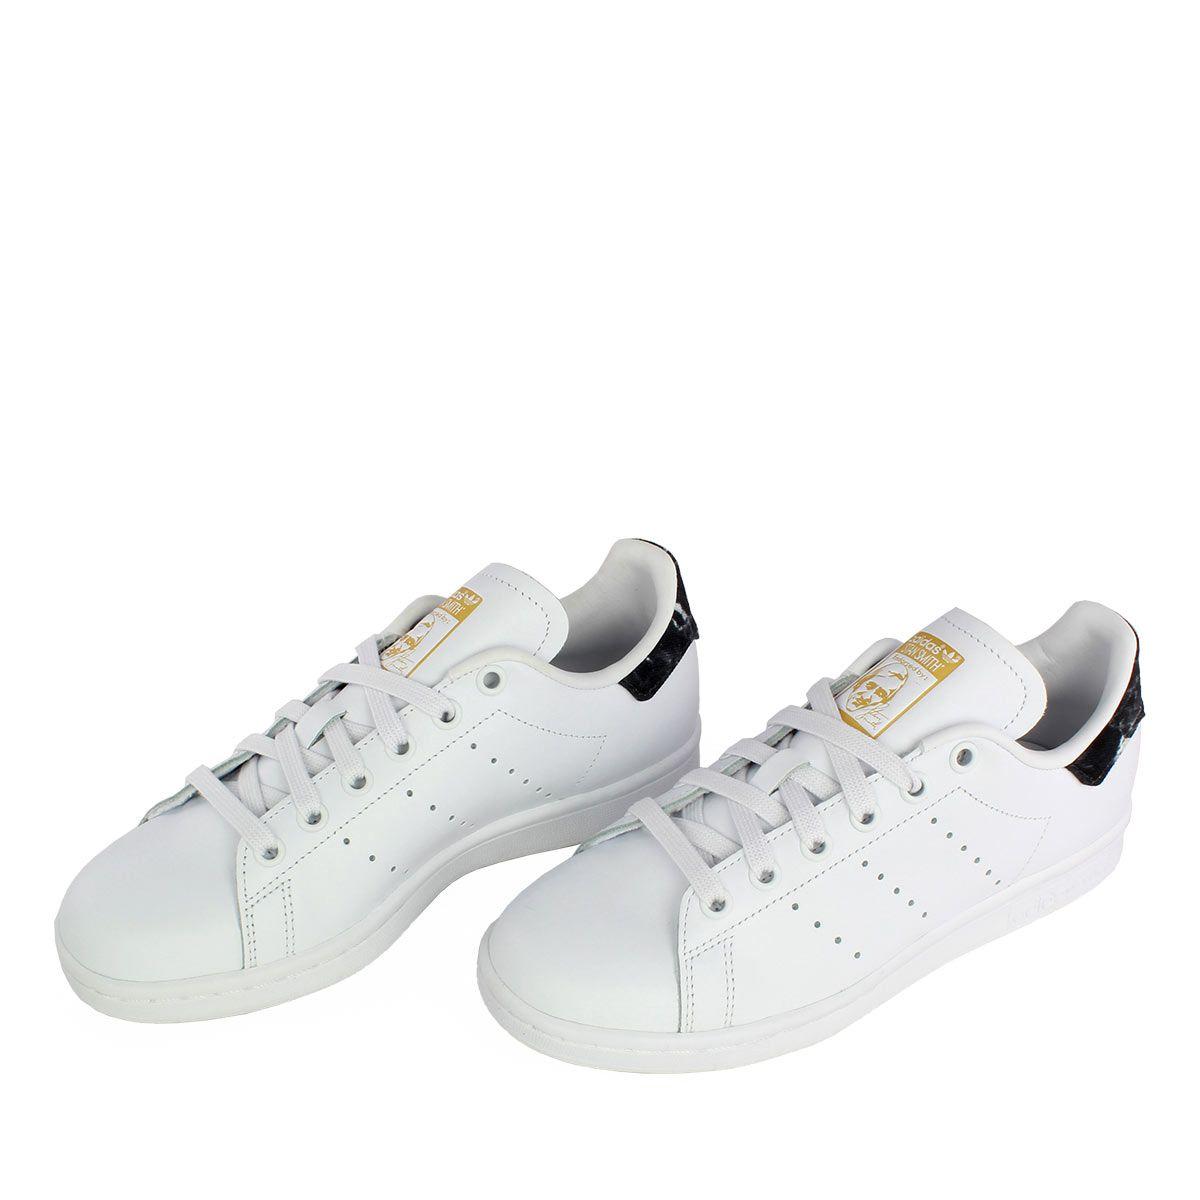 new arrival 6fc6a 76dc7 Adidas Stan Smith λευκό με μαύρες marble λεπτομέρειες, αποτελεί αναπόσπαστο  κομμάτι της μόδας.